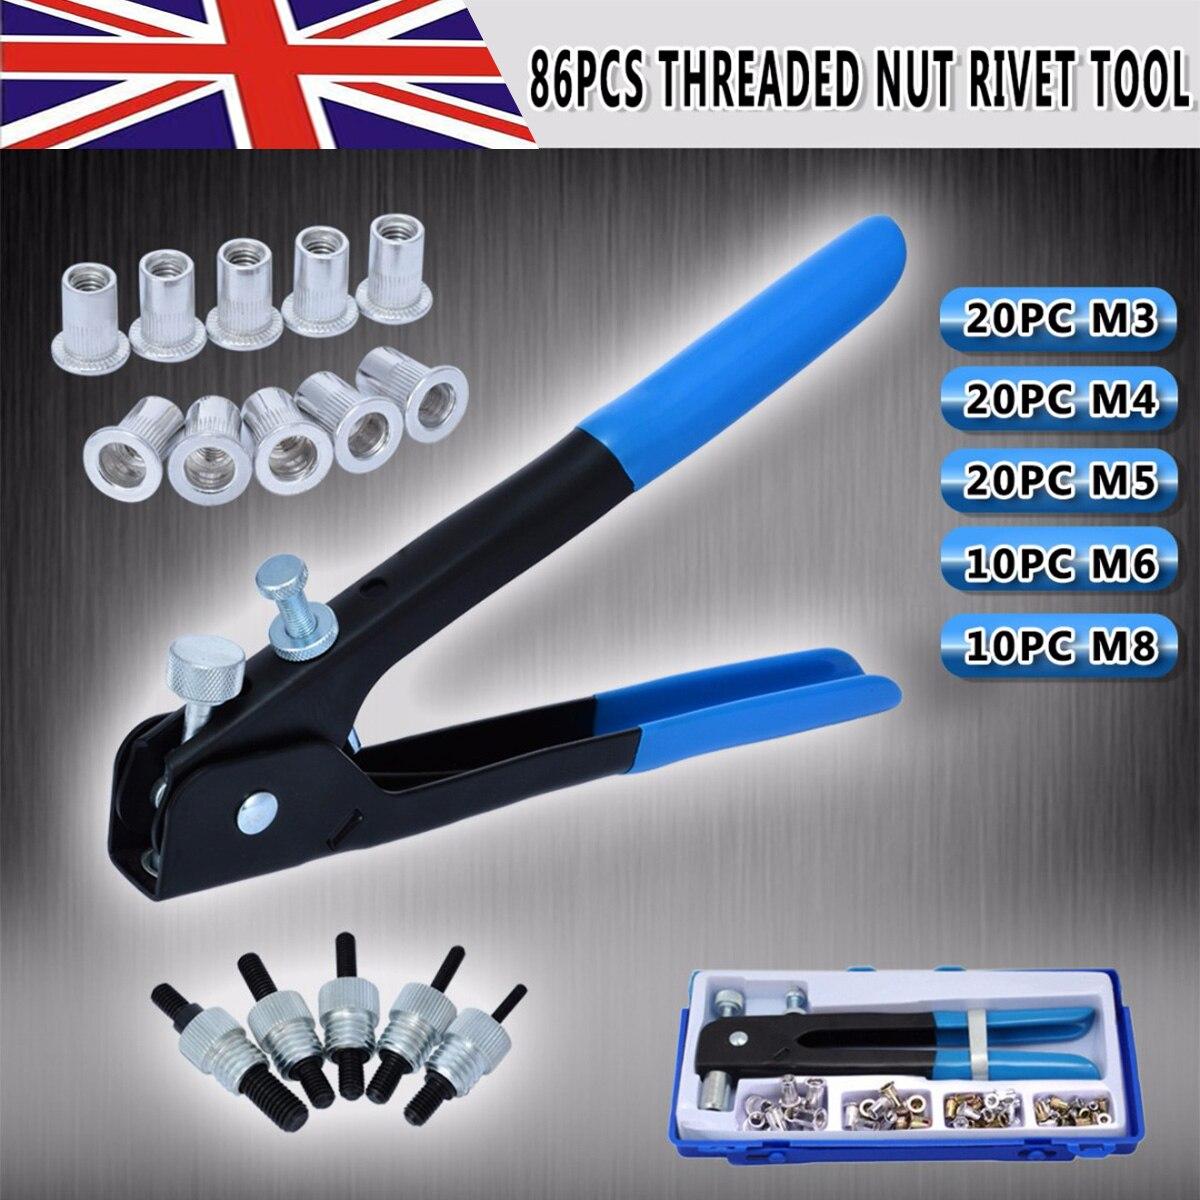 Brand New 86pcs Threaded Nut Blind Rivet Gun Large Nut Threaded Insert Manual Rivet M3-M8 Household Repair Tools